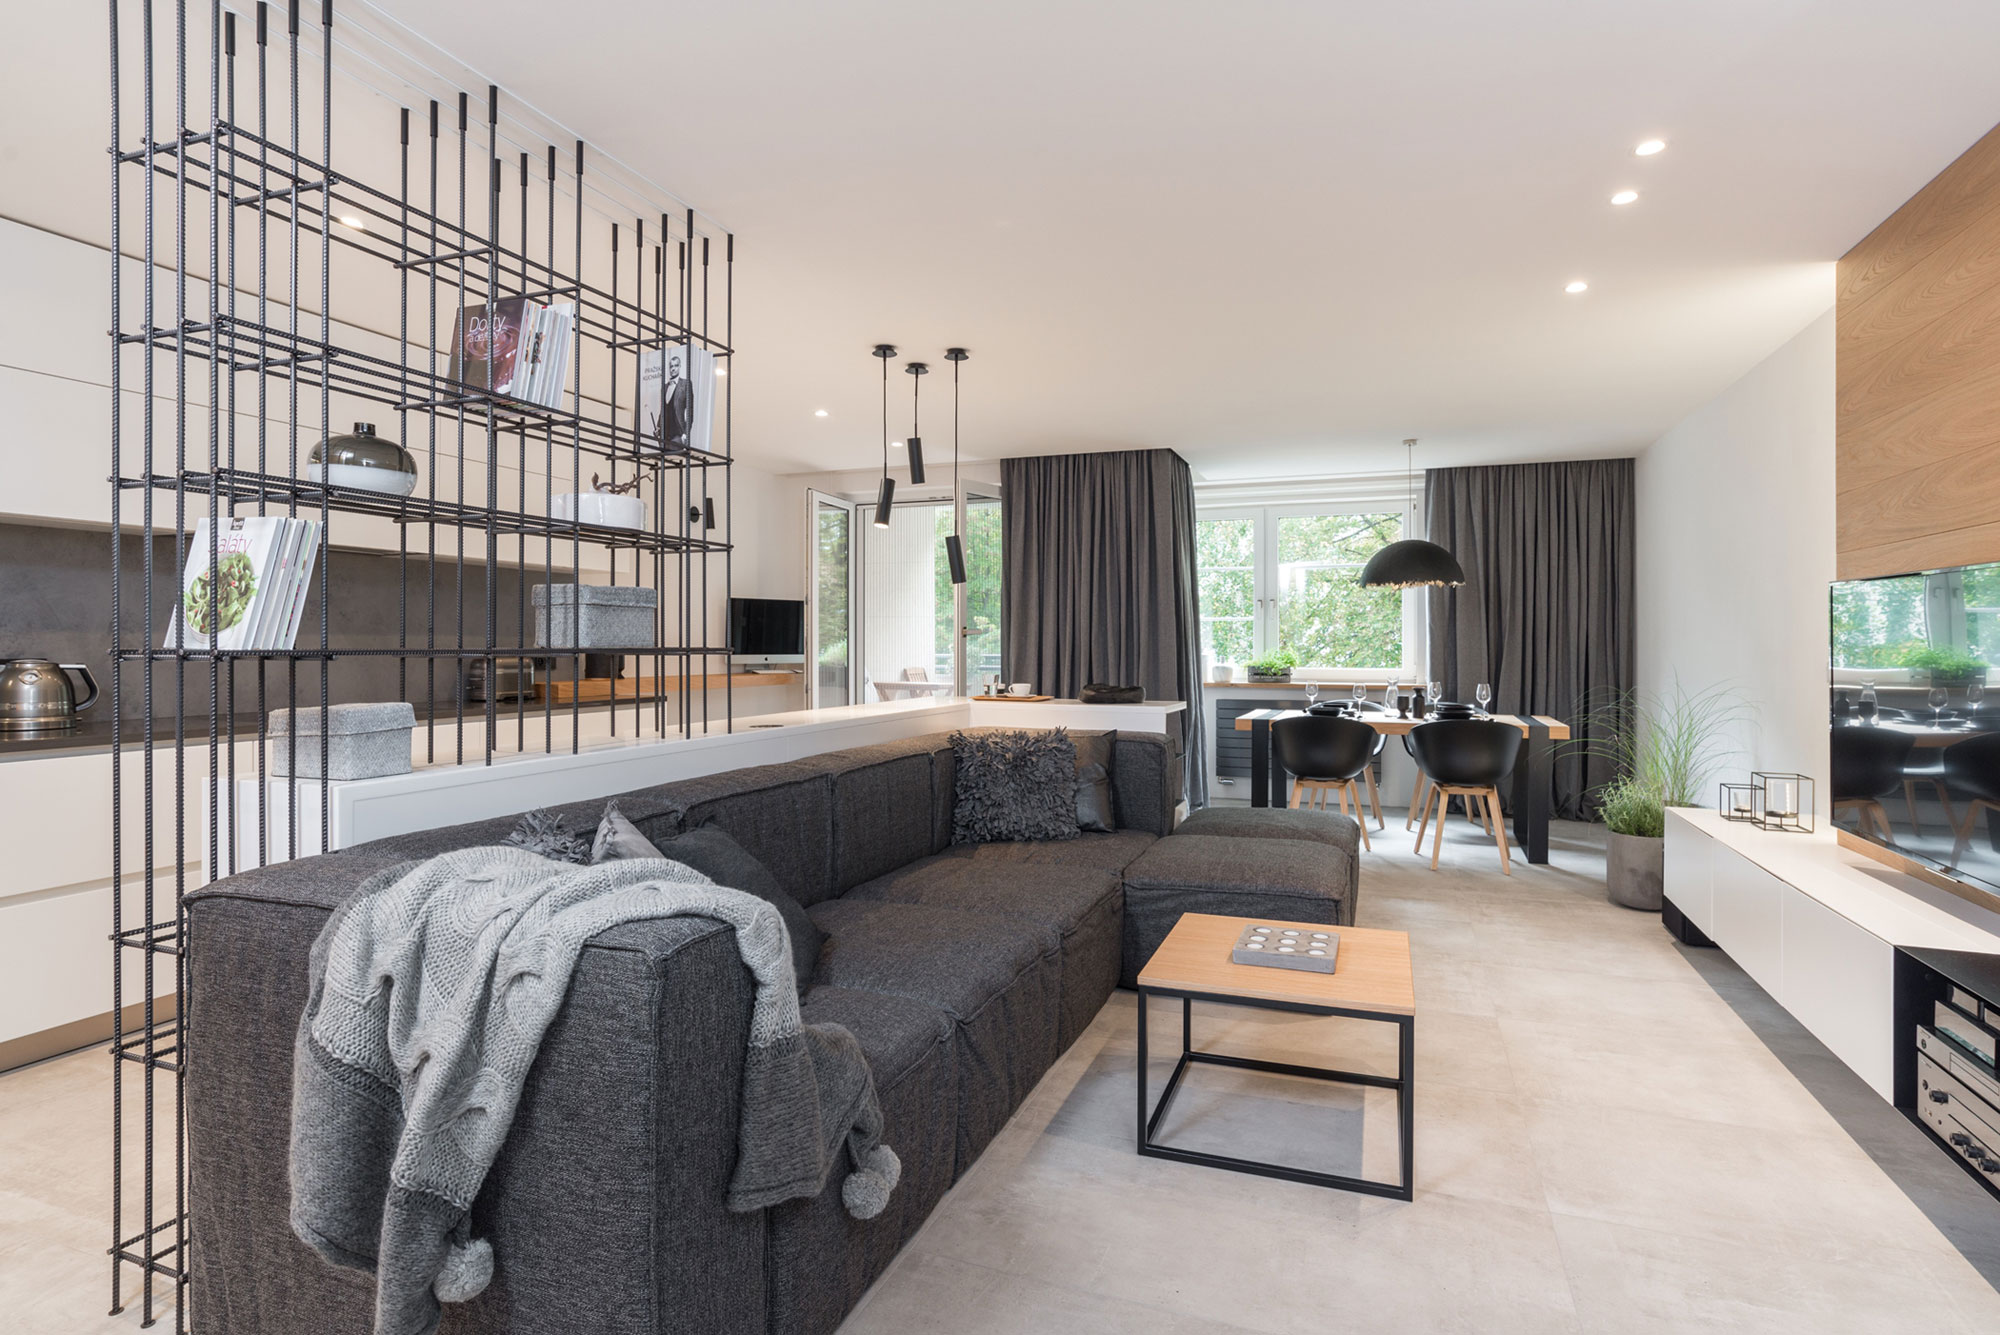 OOOOX Designs an Elegant Apartment in Prague, Czech Republic